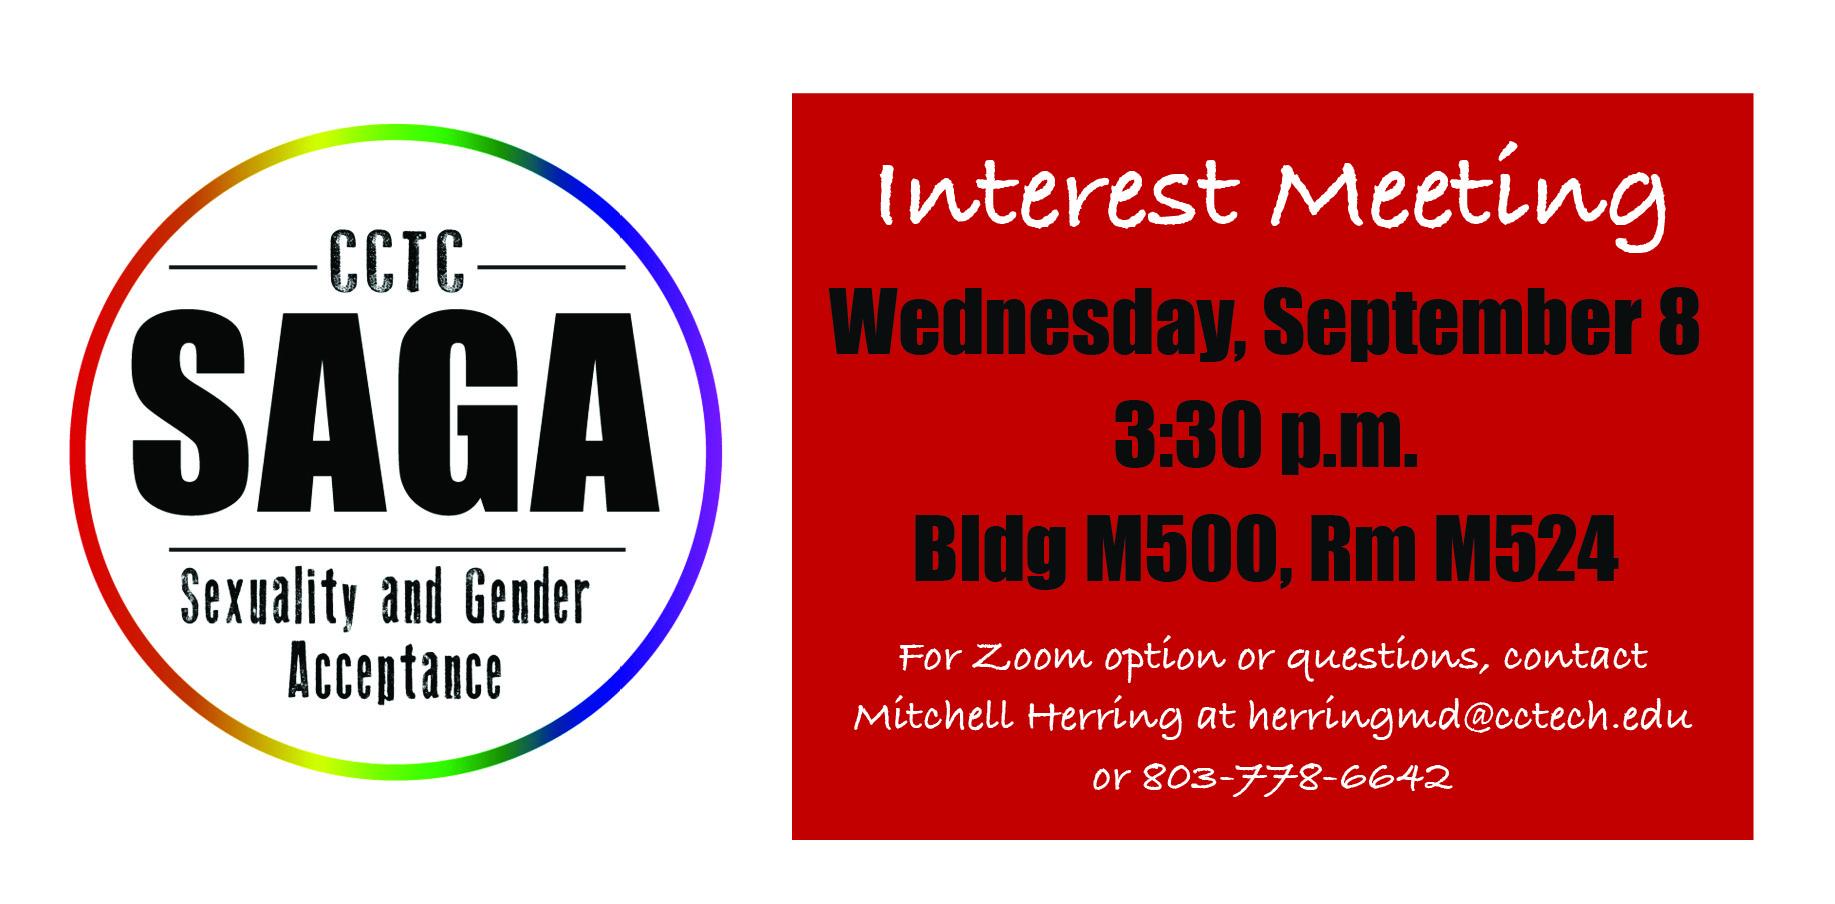 SAGA Interest Meeting